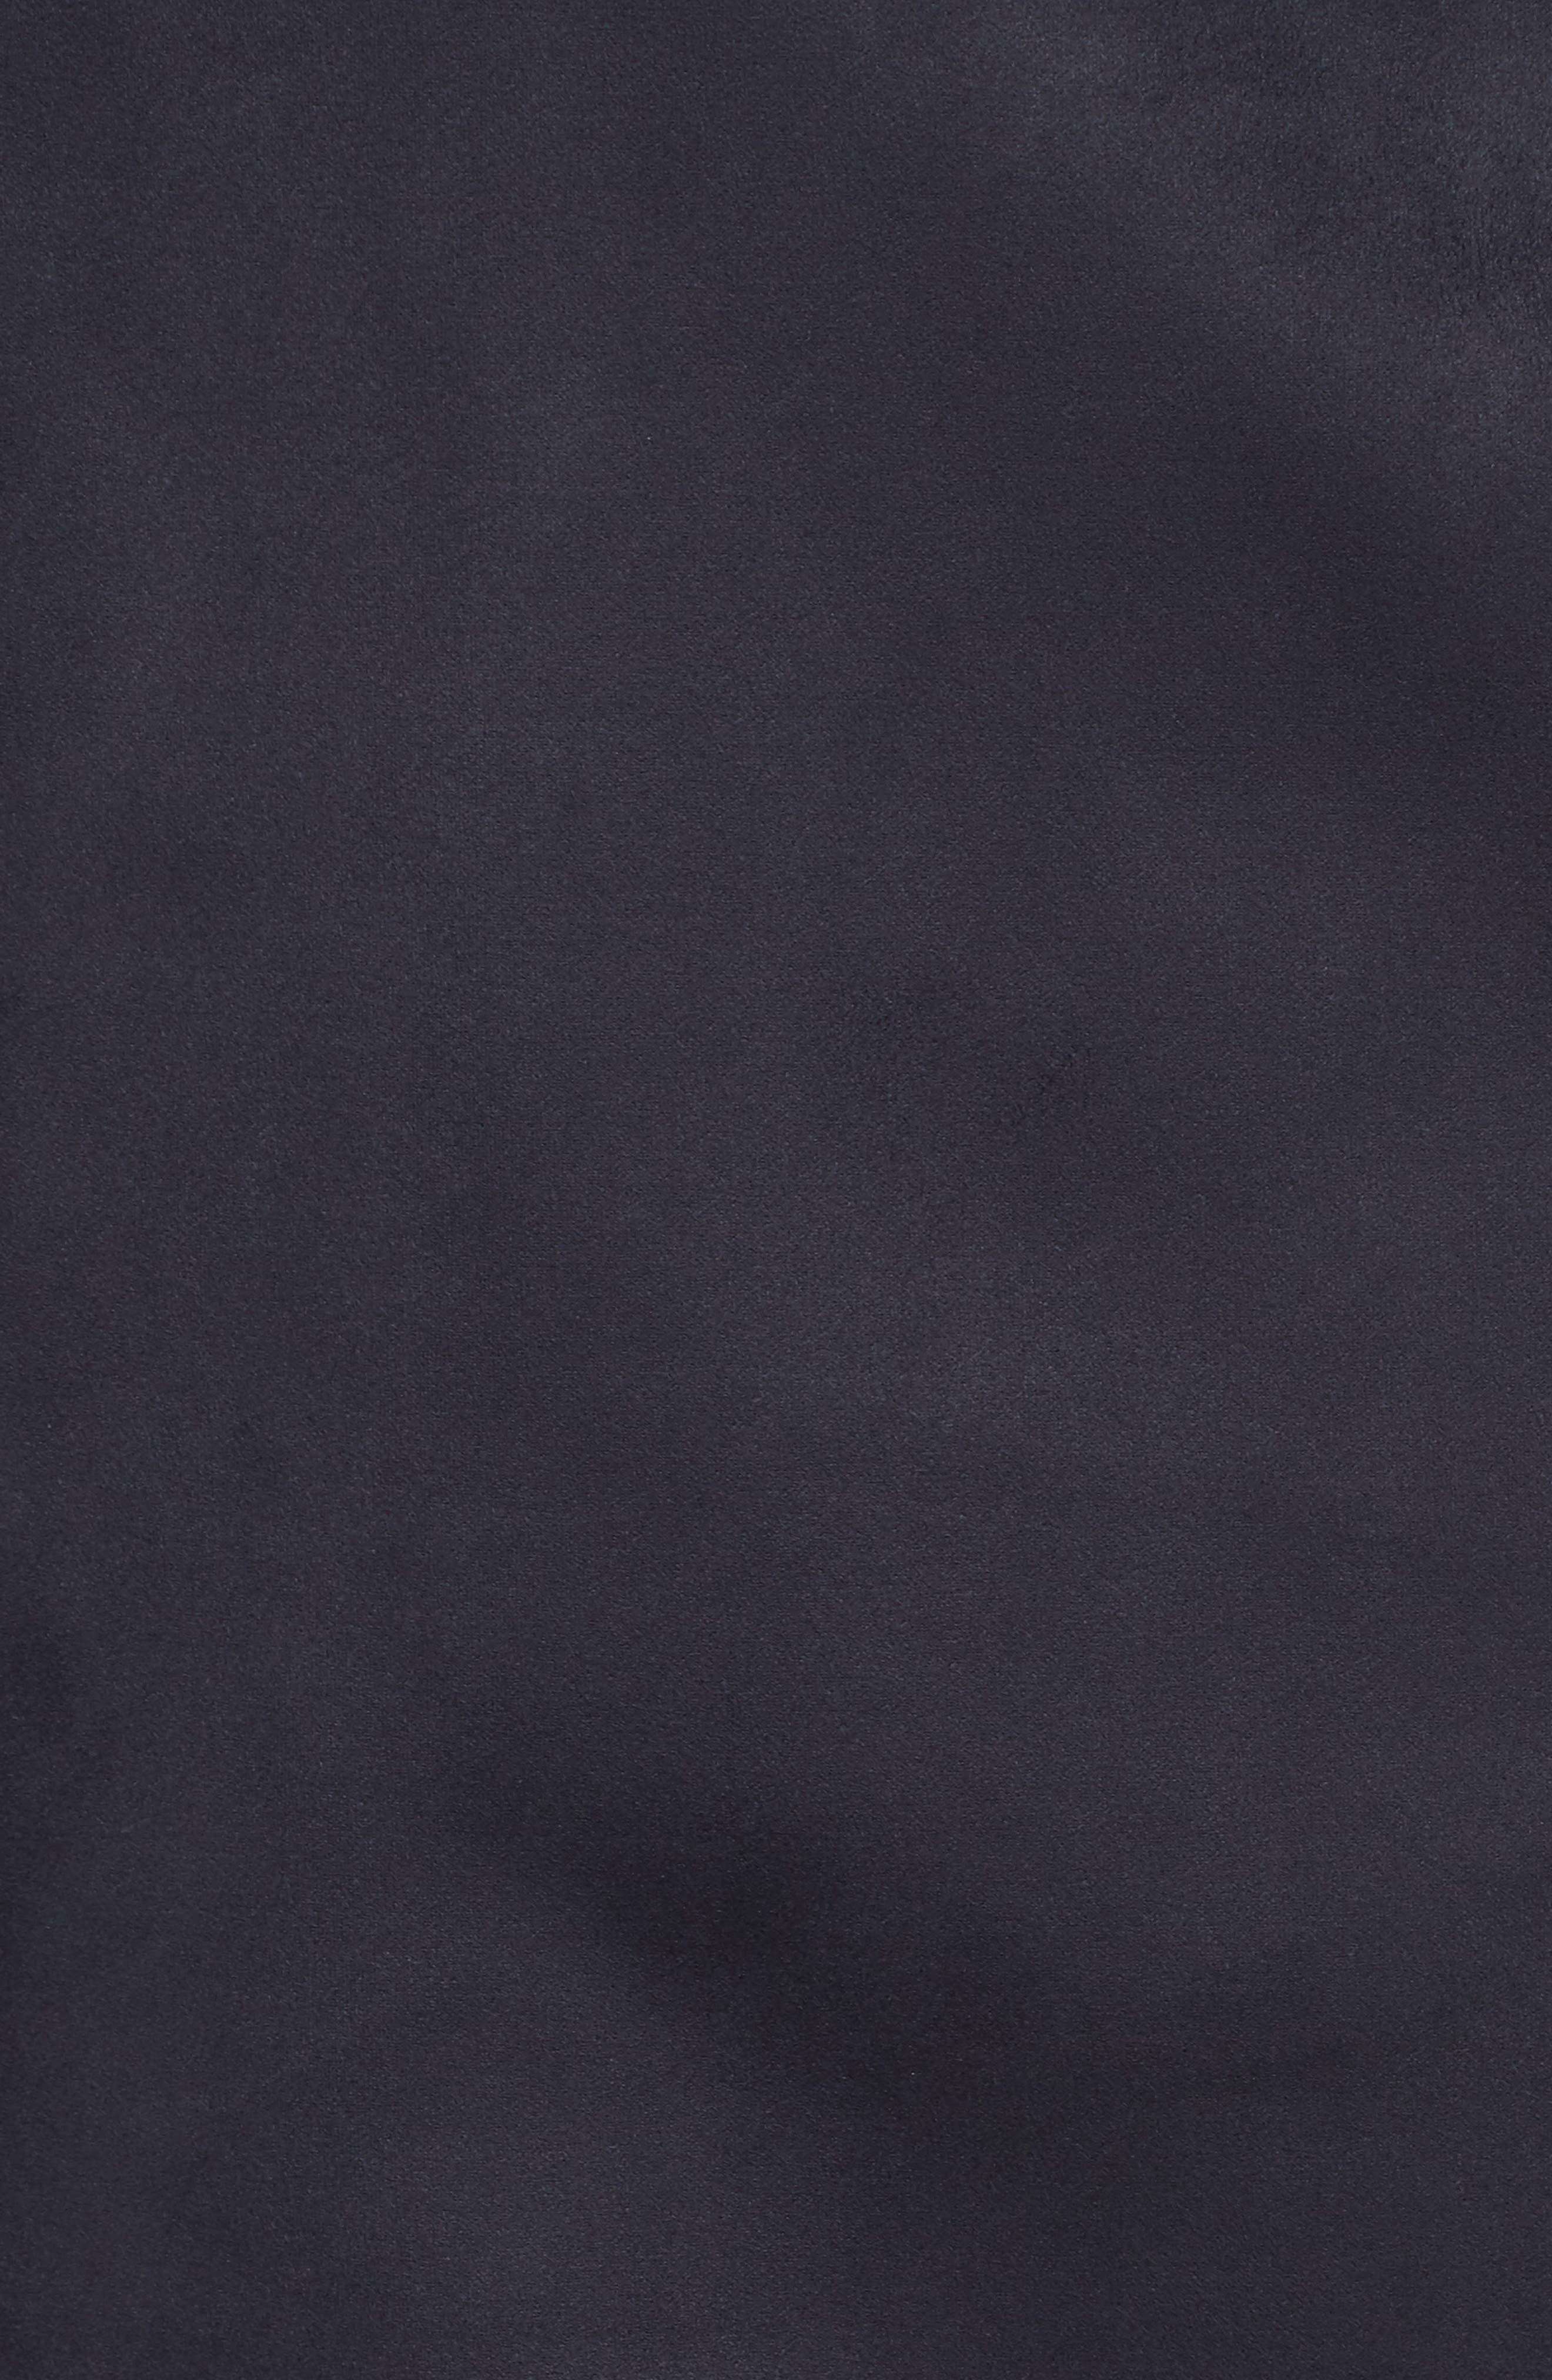 Napoli Faux Sude Duster Jacket,                             Alternate thumbnail 6, color,                             411